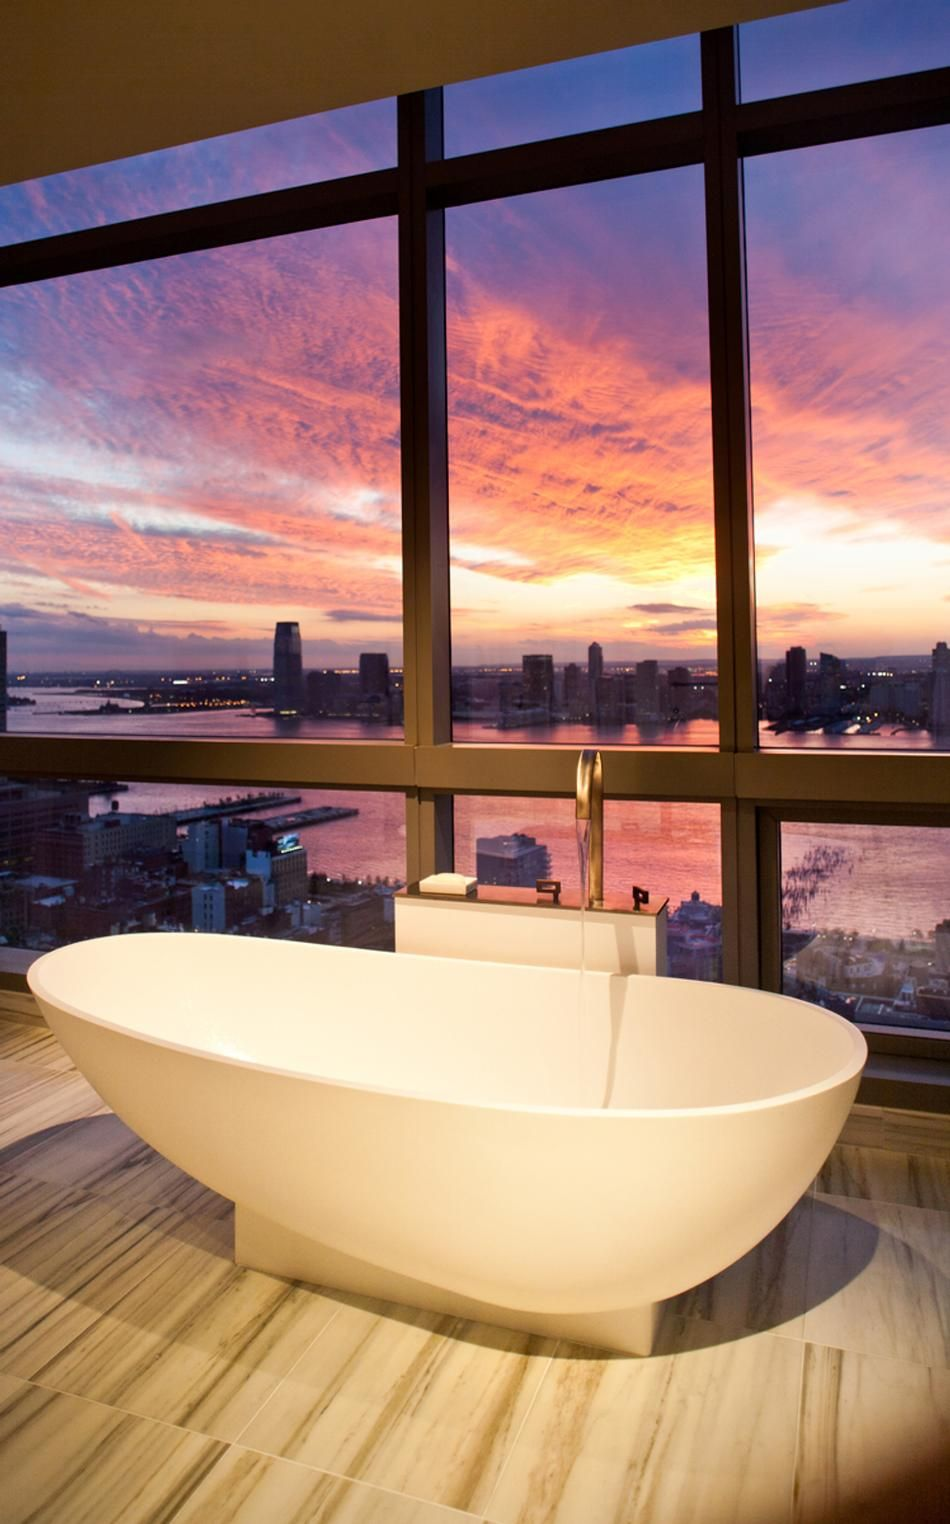 Trump Soho Hotel Inium Has An Amazing View Of The New York City Skyline